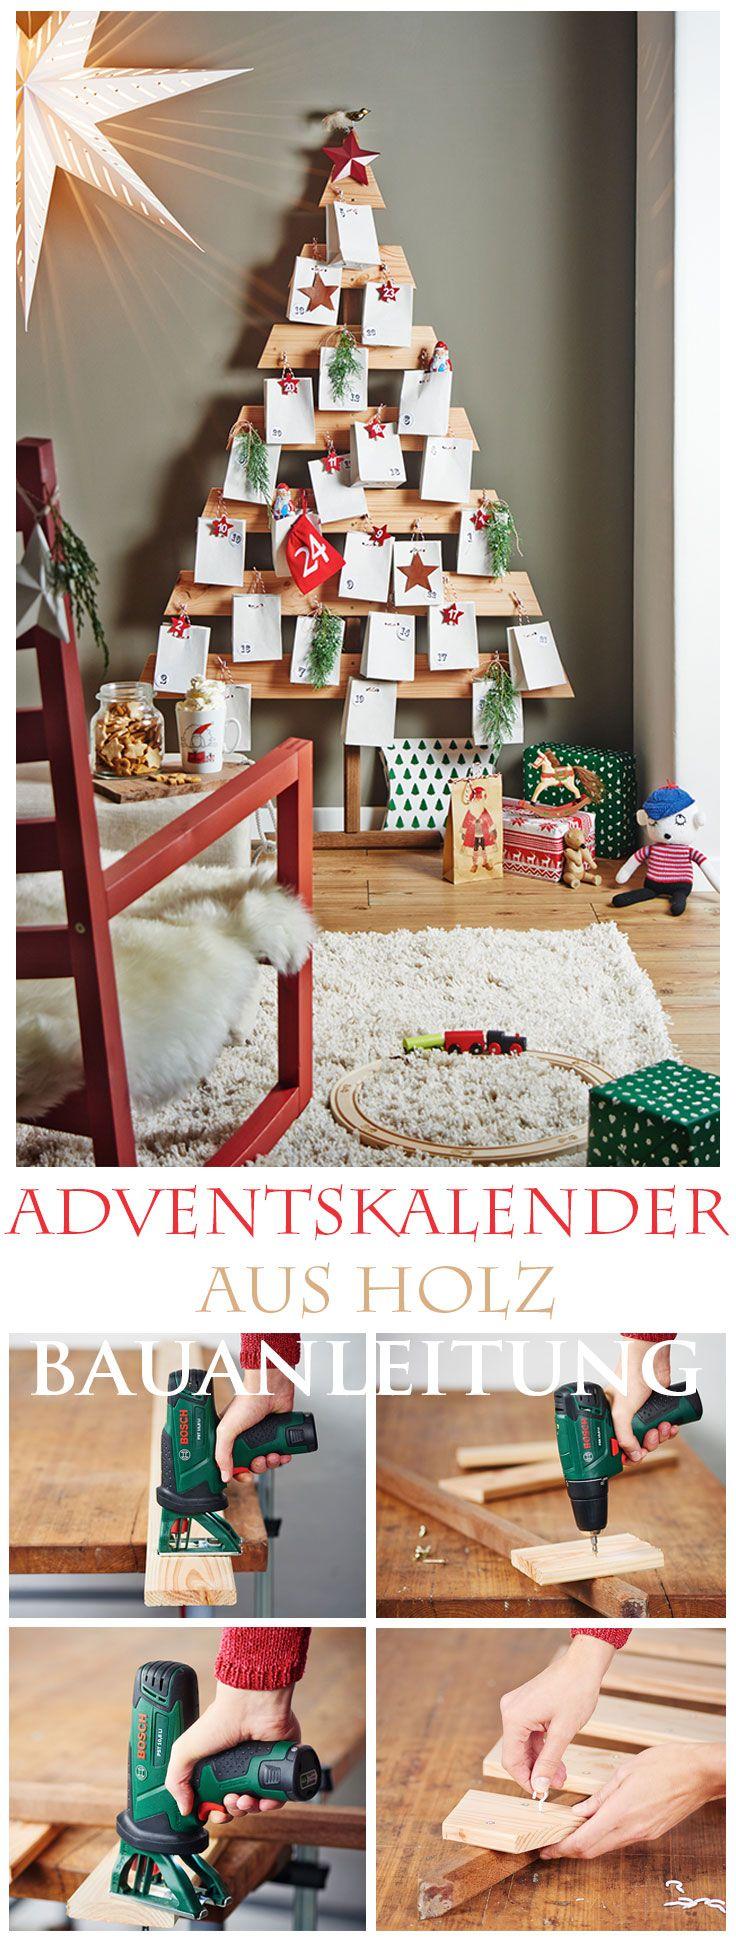 Adventskalender Aus Holz Winter Advent Inspiration Diy Advent